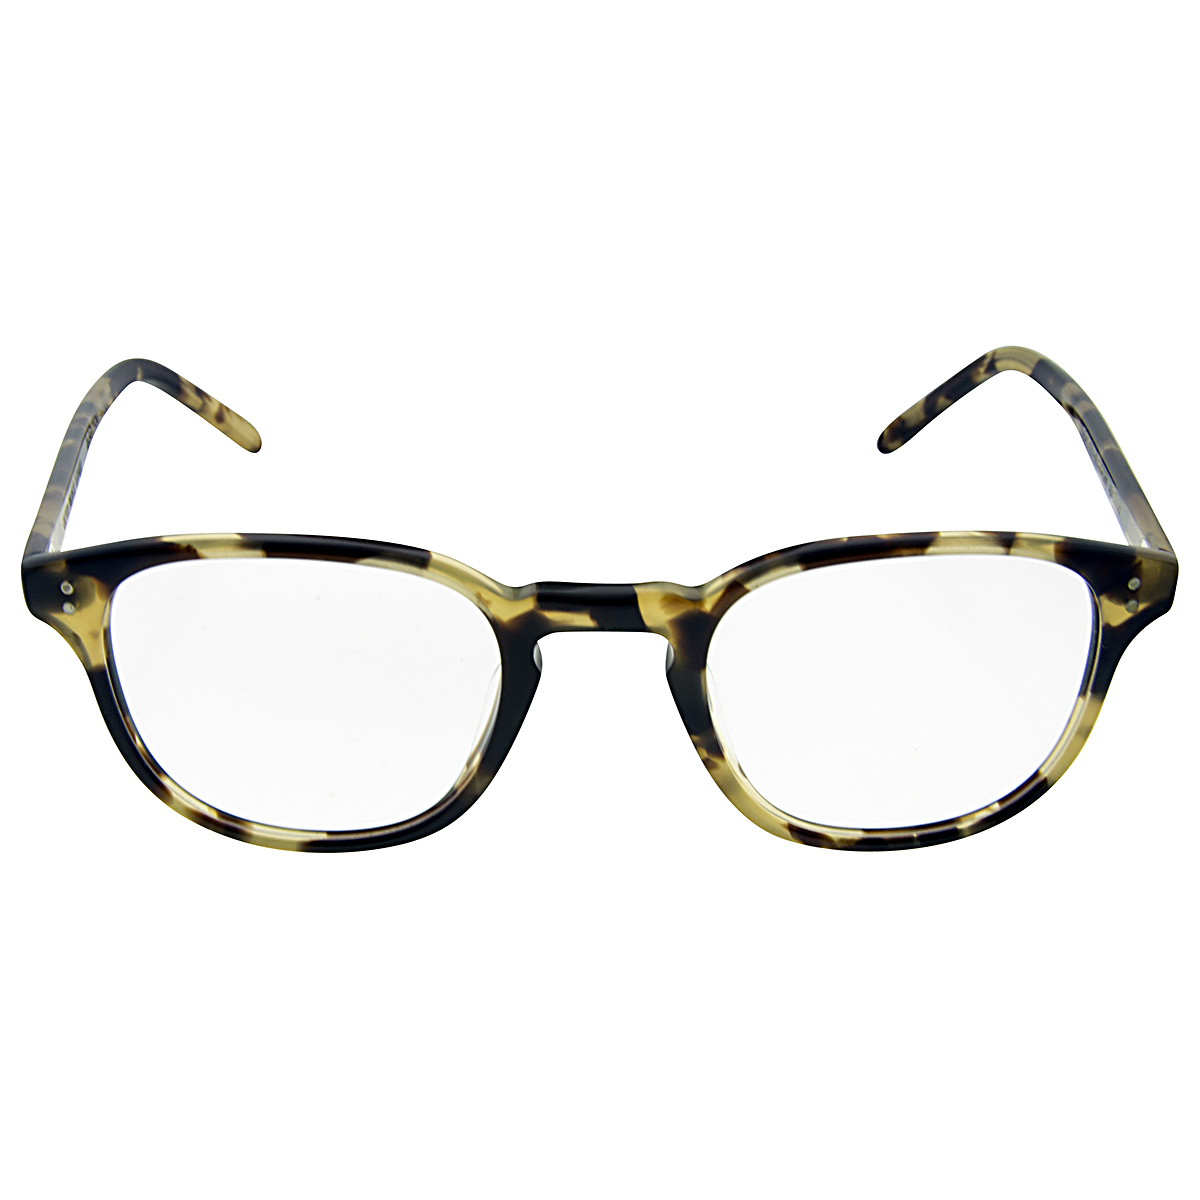 0e66cbee745 Details about Oliver Peoples OV5219 1550 Fairmont RX Eyeglasses 49